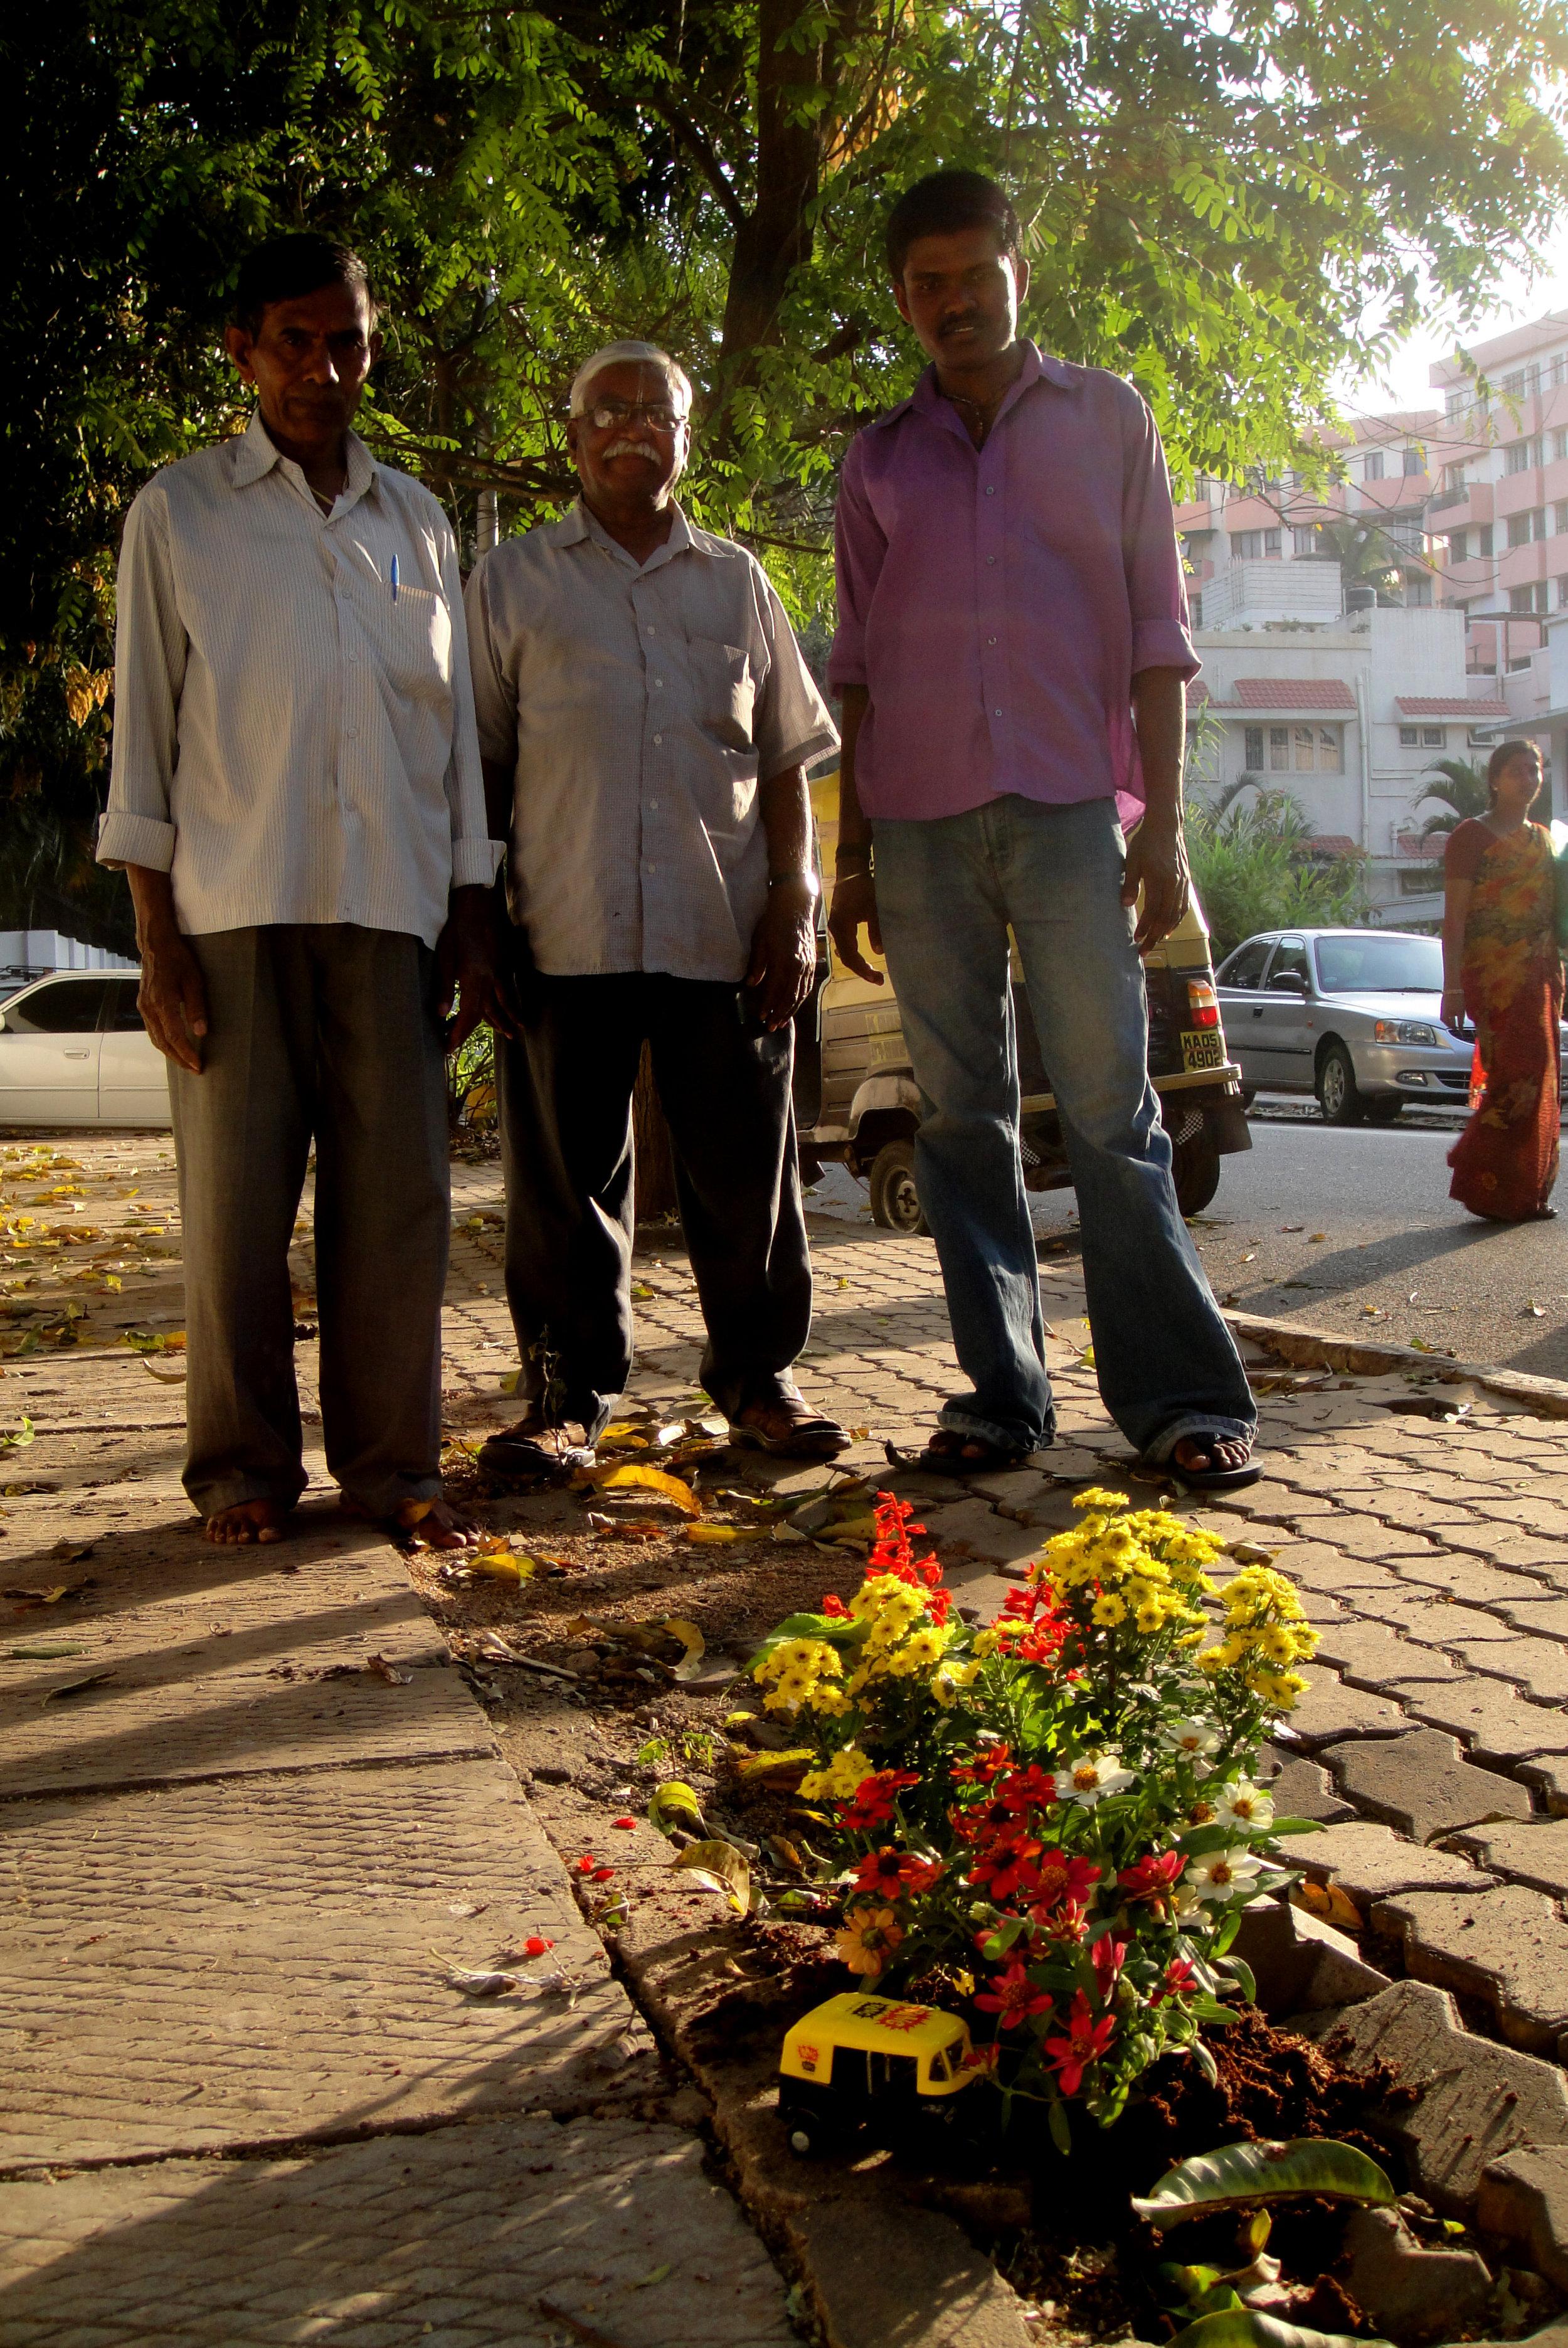 Pothole gardener steve wheen guerilla gardening India Tuk Tuk flowers onlookers